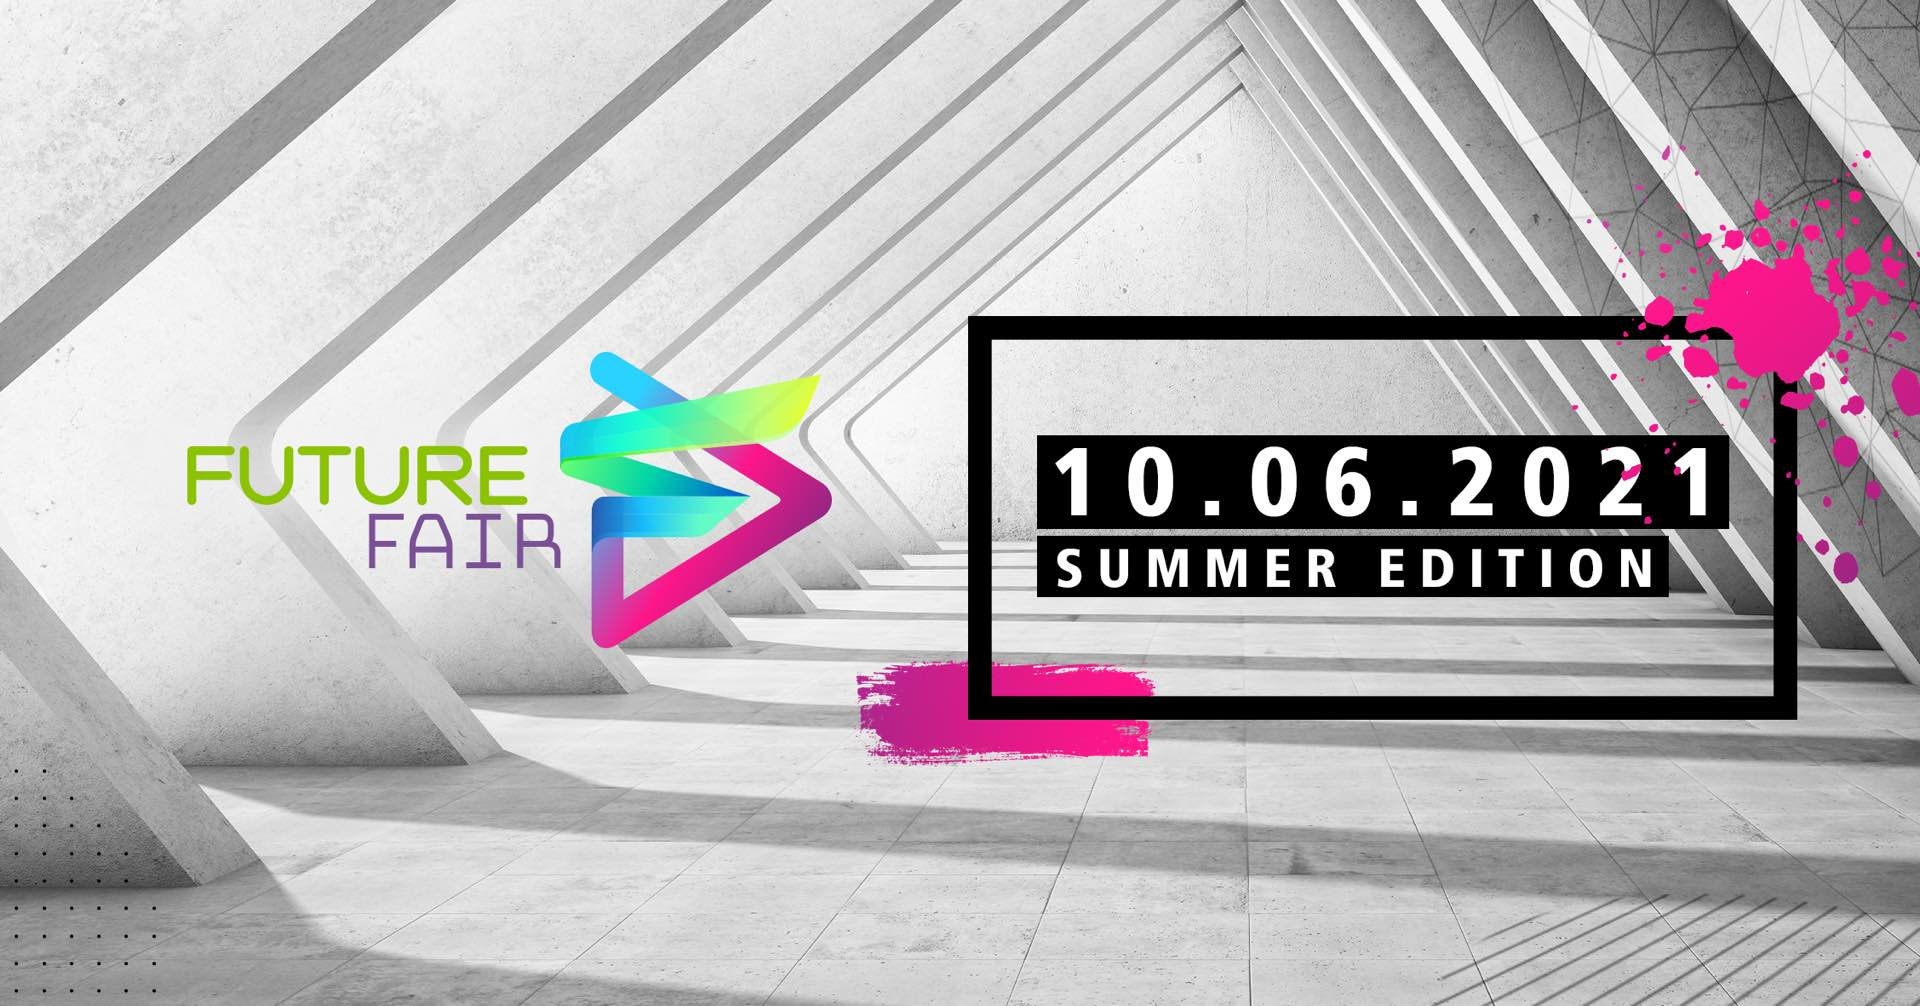 Neyroo veranstaltet Zukunftskonferenz über Live-Events